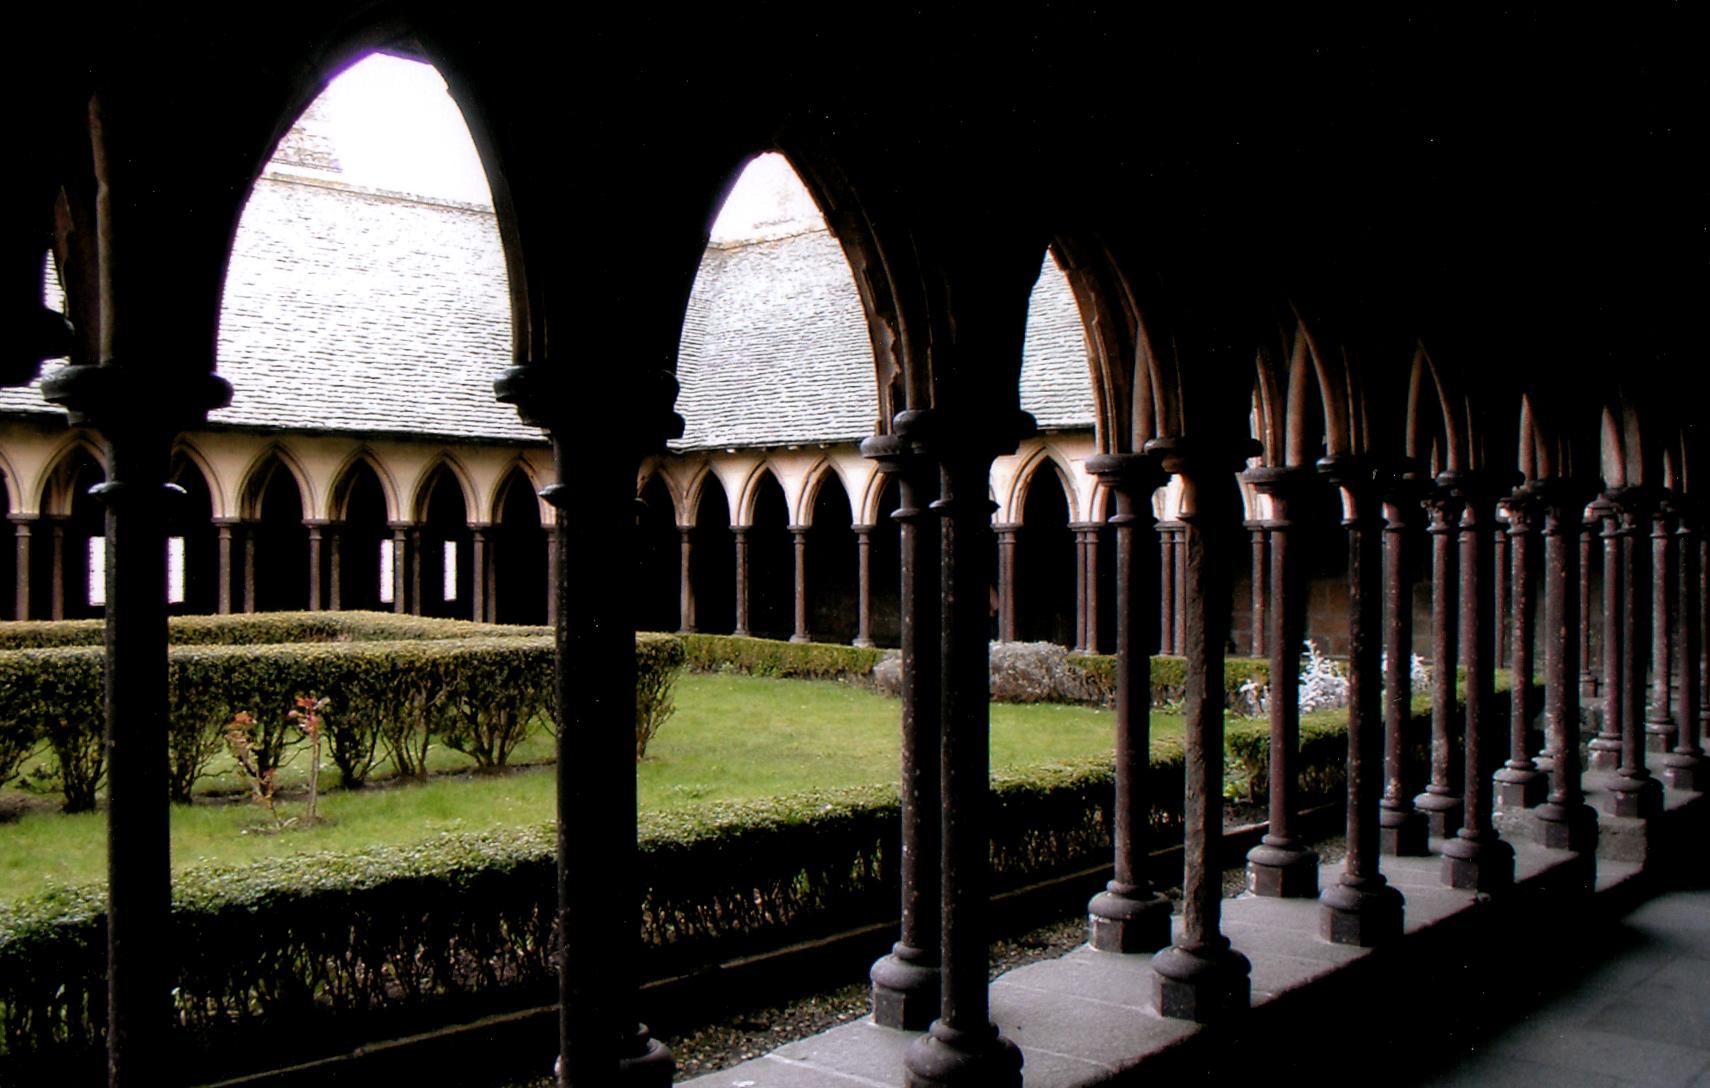 The Courtyard of Mont Saint-Michel.